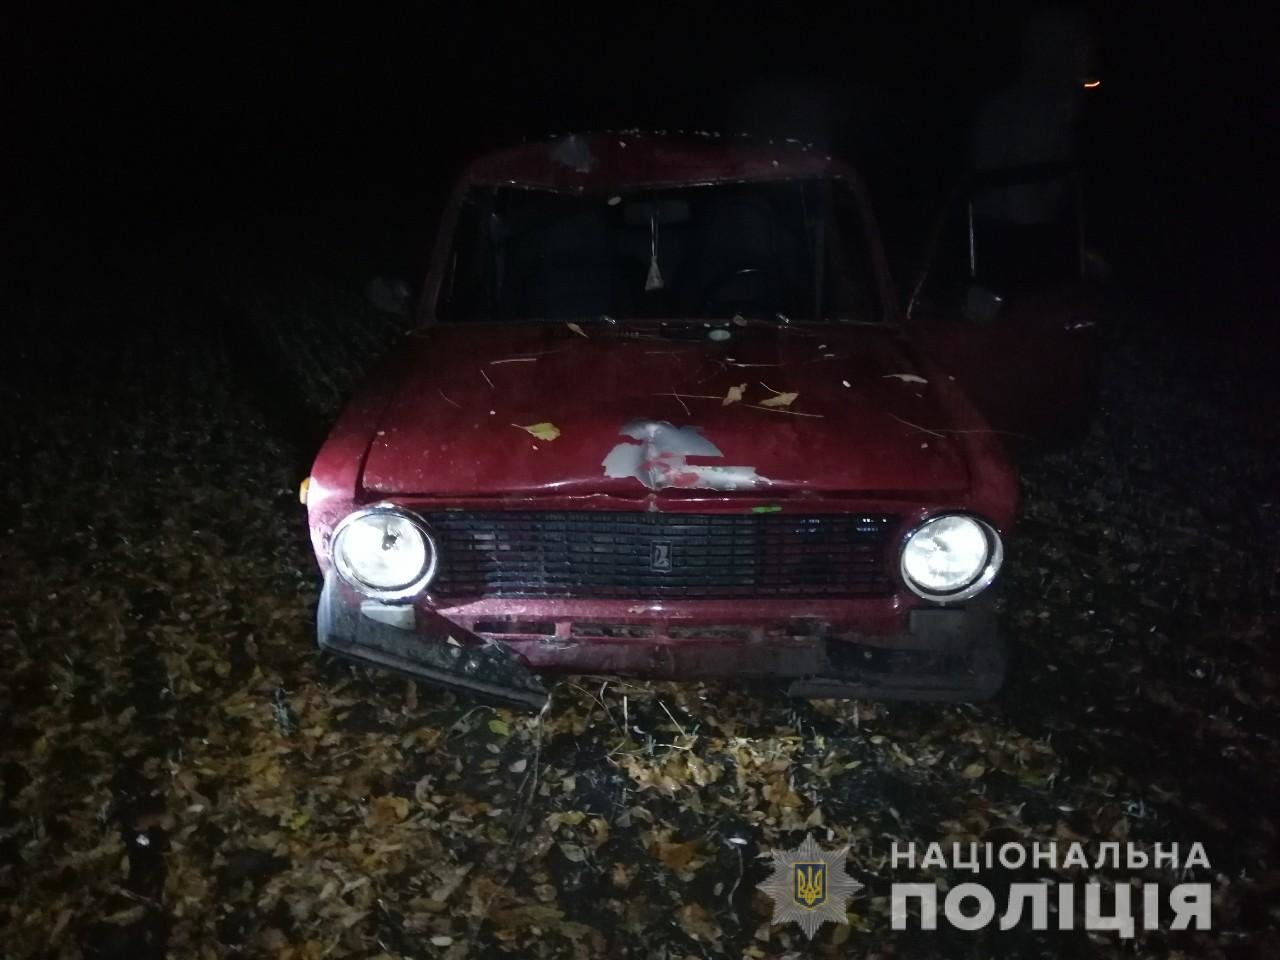 На Харьковщине во время ДТП погибли три человека, - ФОТО, фото-3